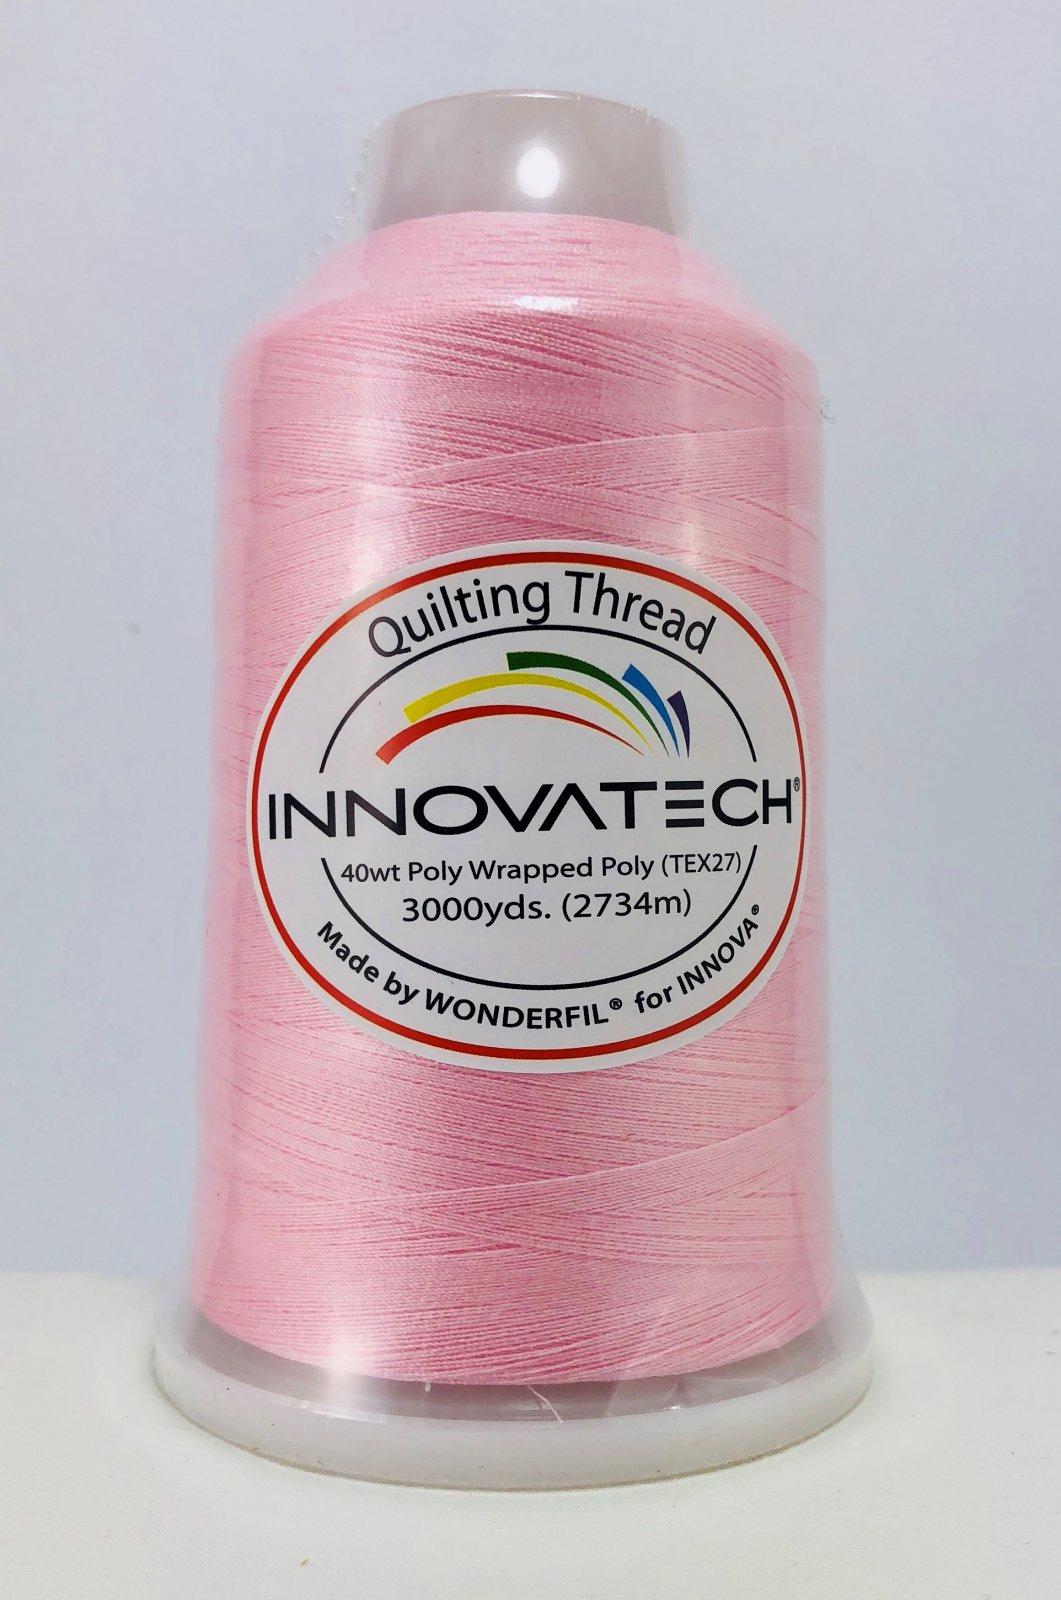 Innovatech THD3053 PW54 BLOSSOM